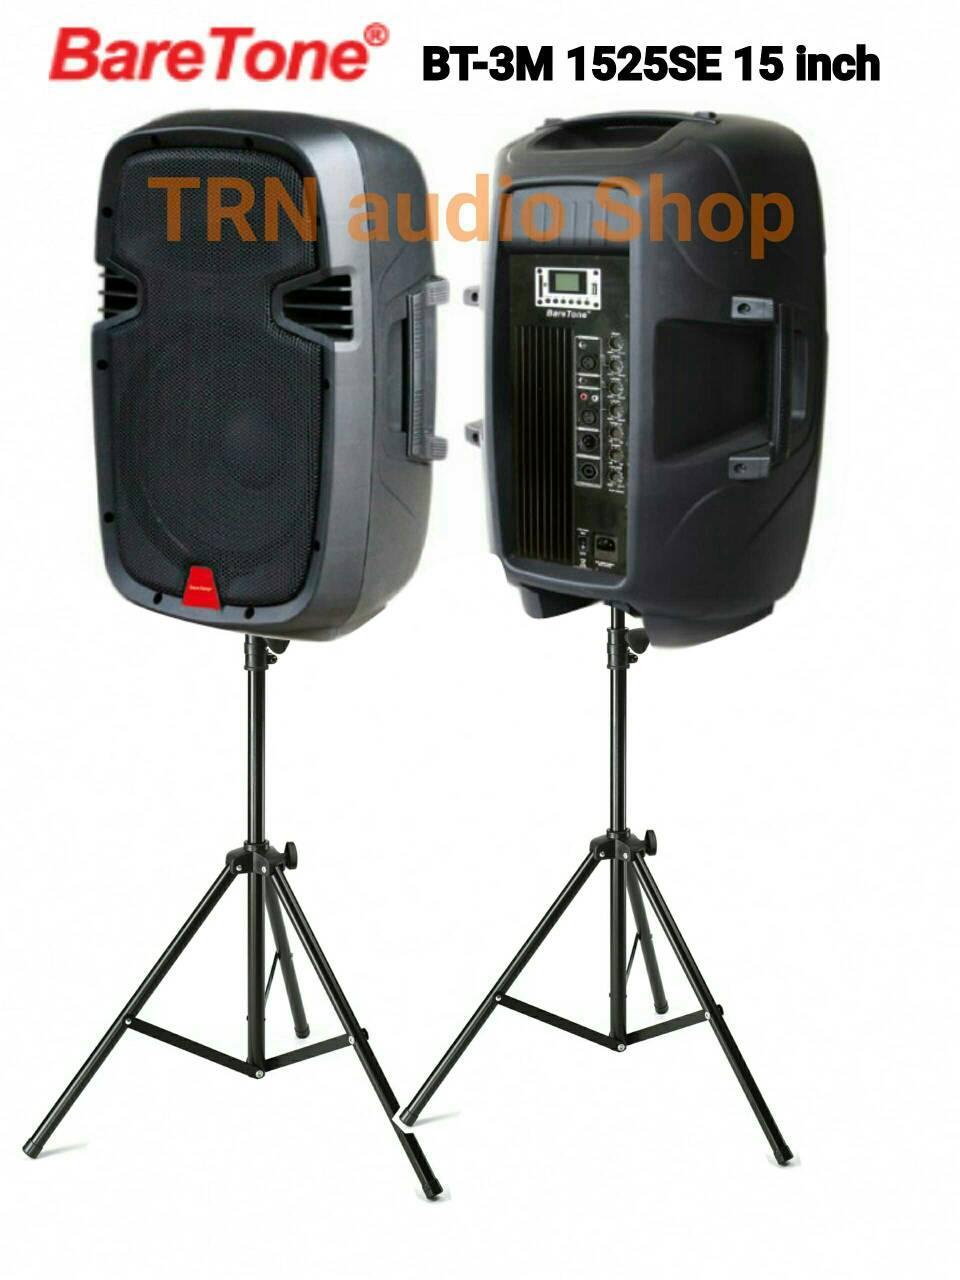 Speaker aktif Baretone BT-3M 1525se 15 in sepasang + Stand Speaker